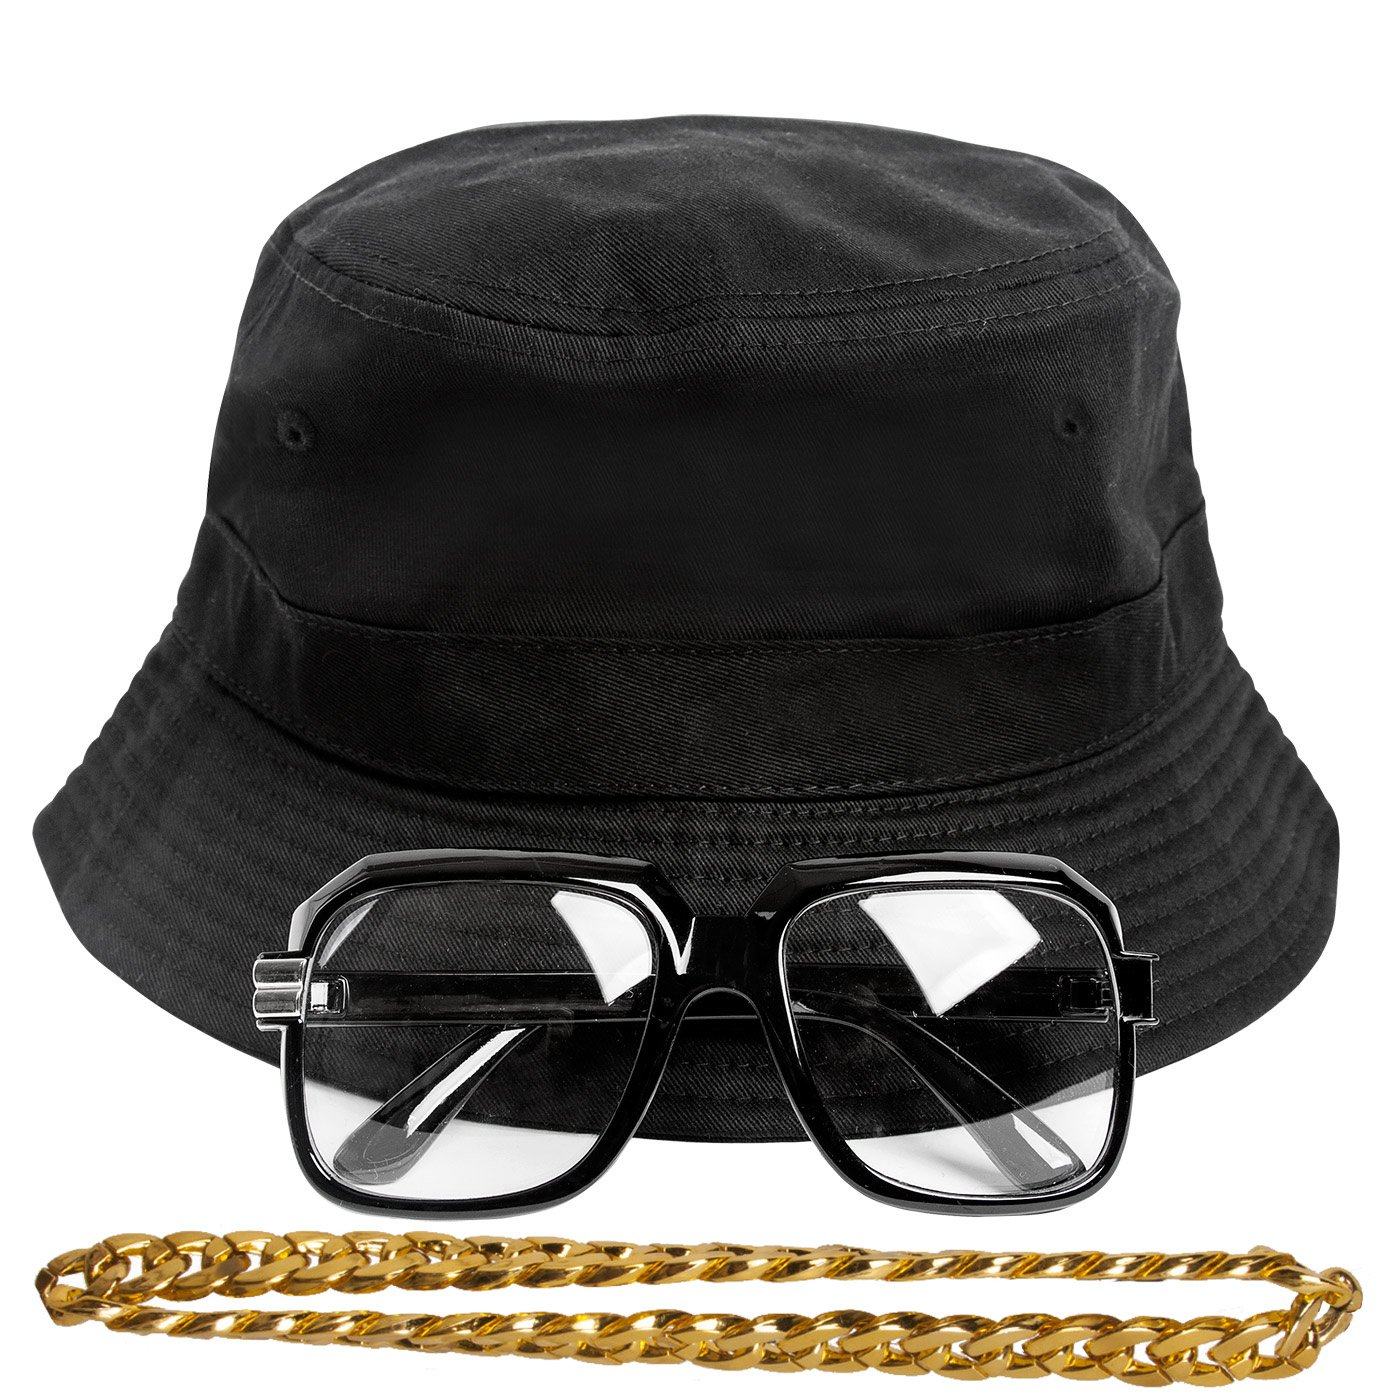 Gravity Trading 90s Hip-Hop Gold Chain Costume Kit (Bucket Hat + Sunglass + Gold Chain) Black S/M